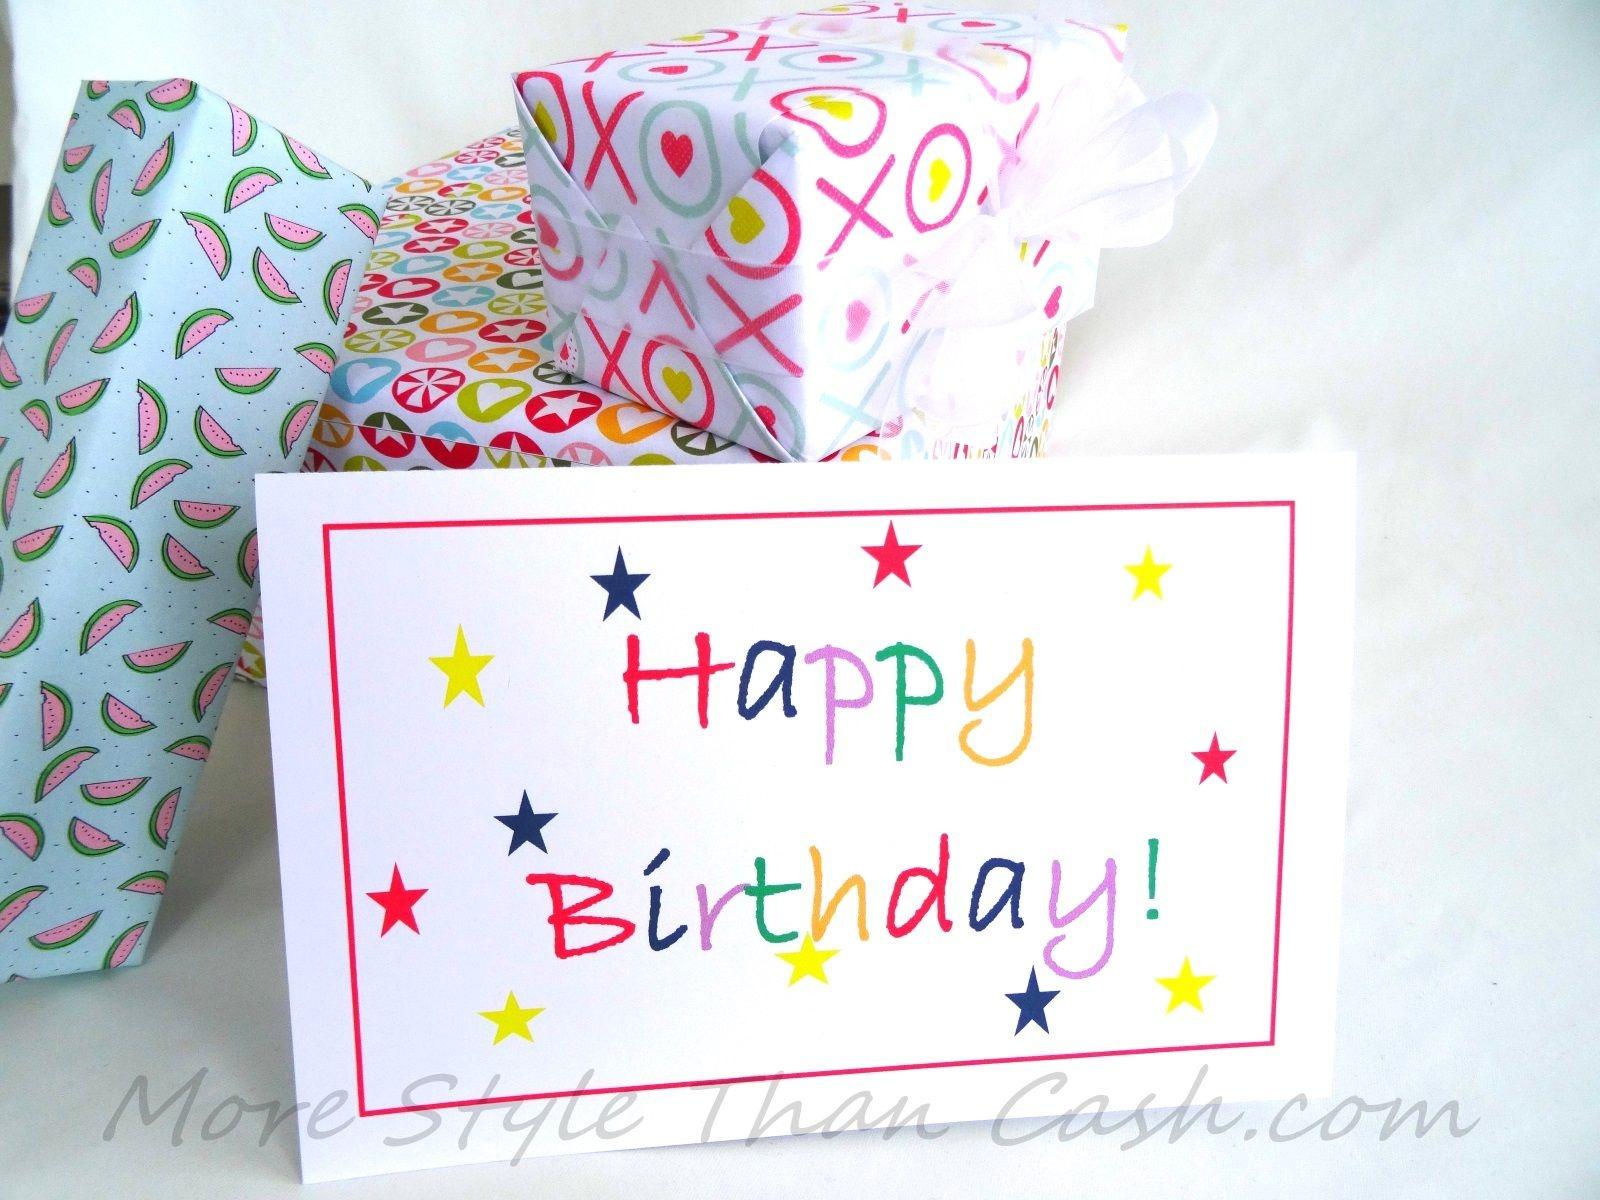 Free Printable Birthday Card   Great Teacher Stuff!!!   Free - Free Printable Birthday Cards For Her